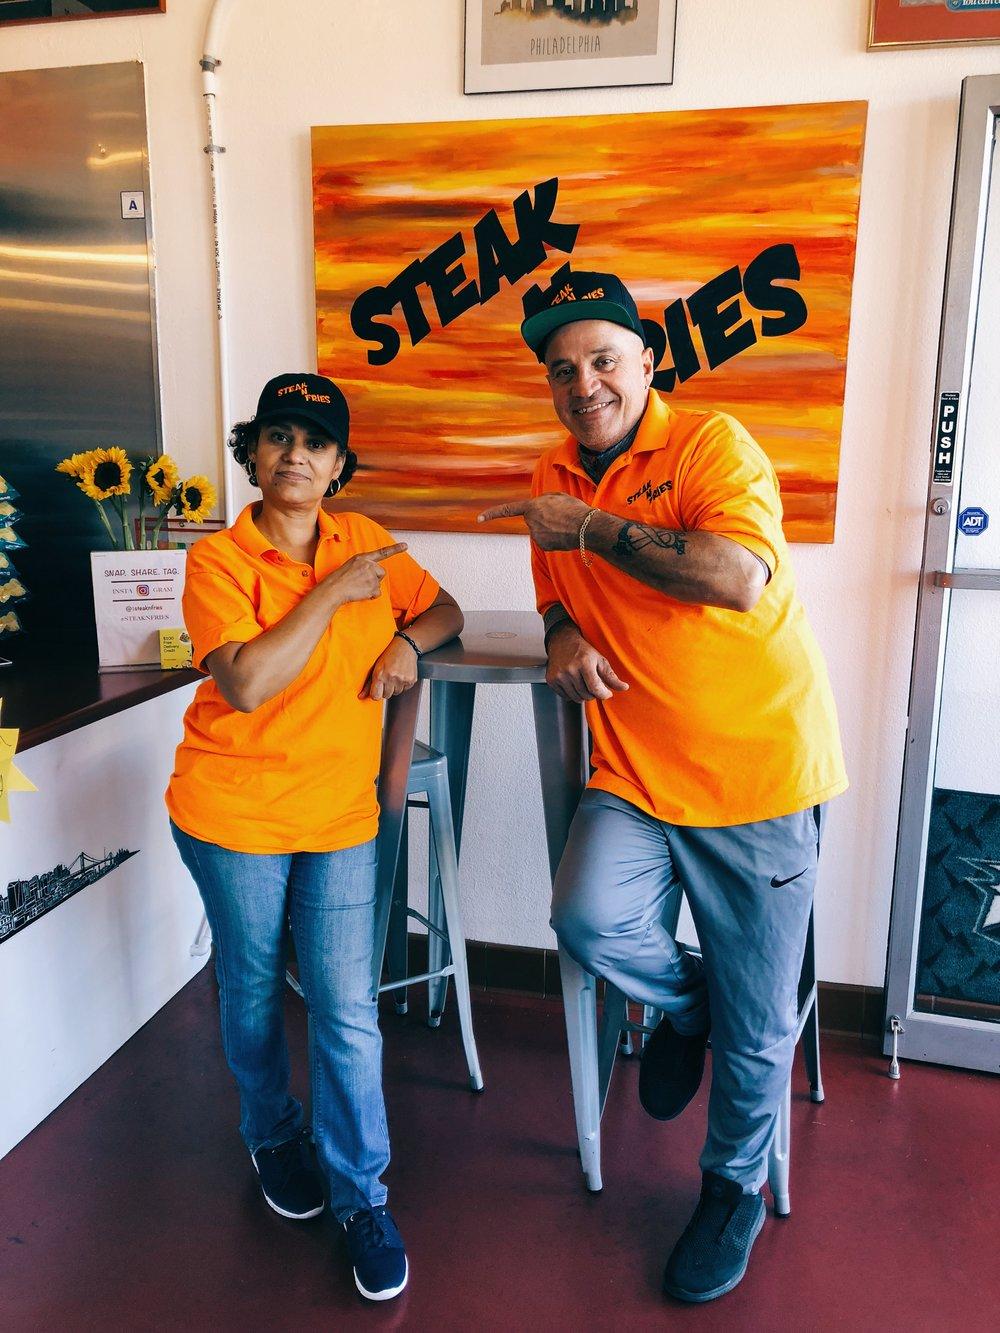 Angela and Angel, Owners of Steak N Fries